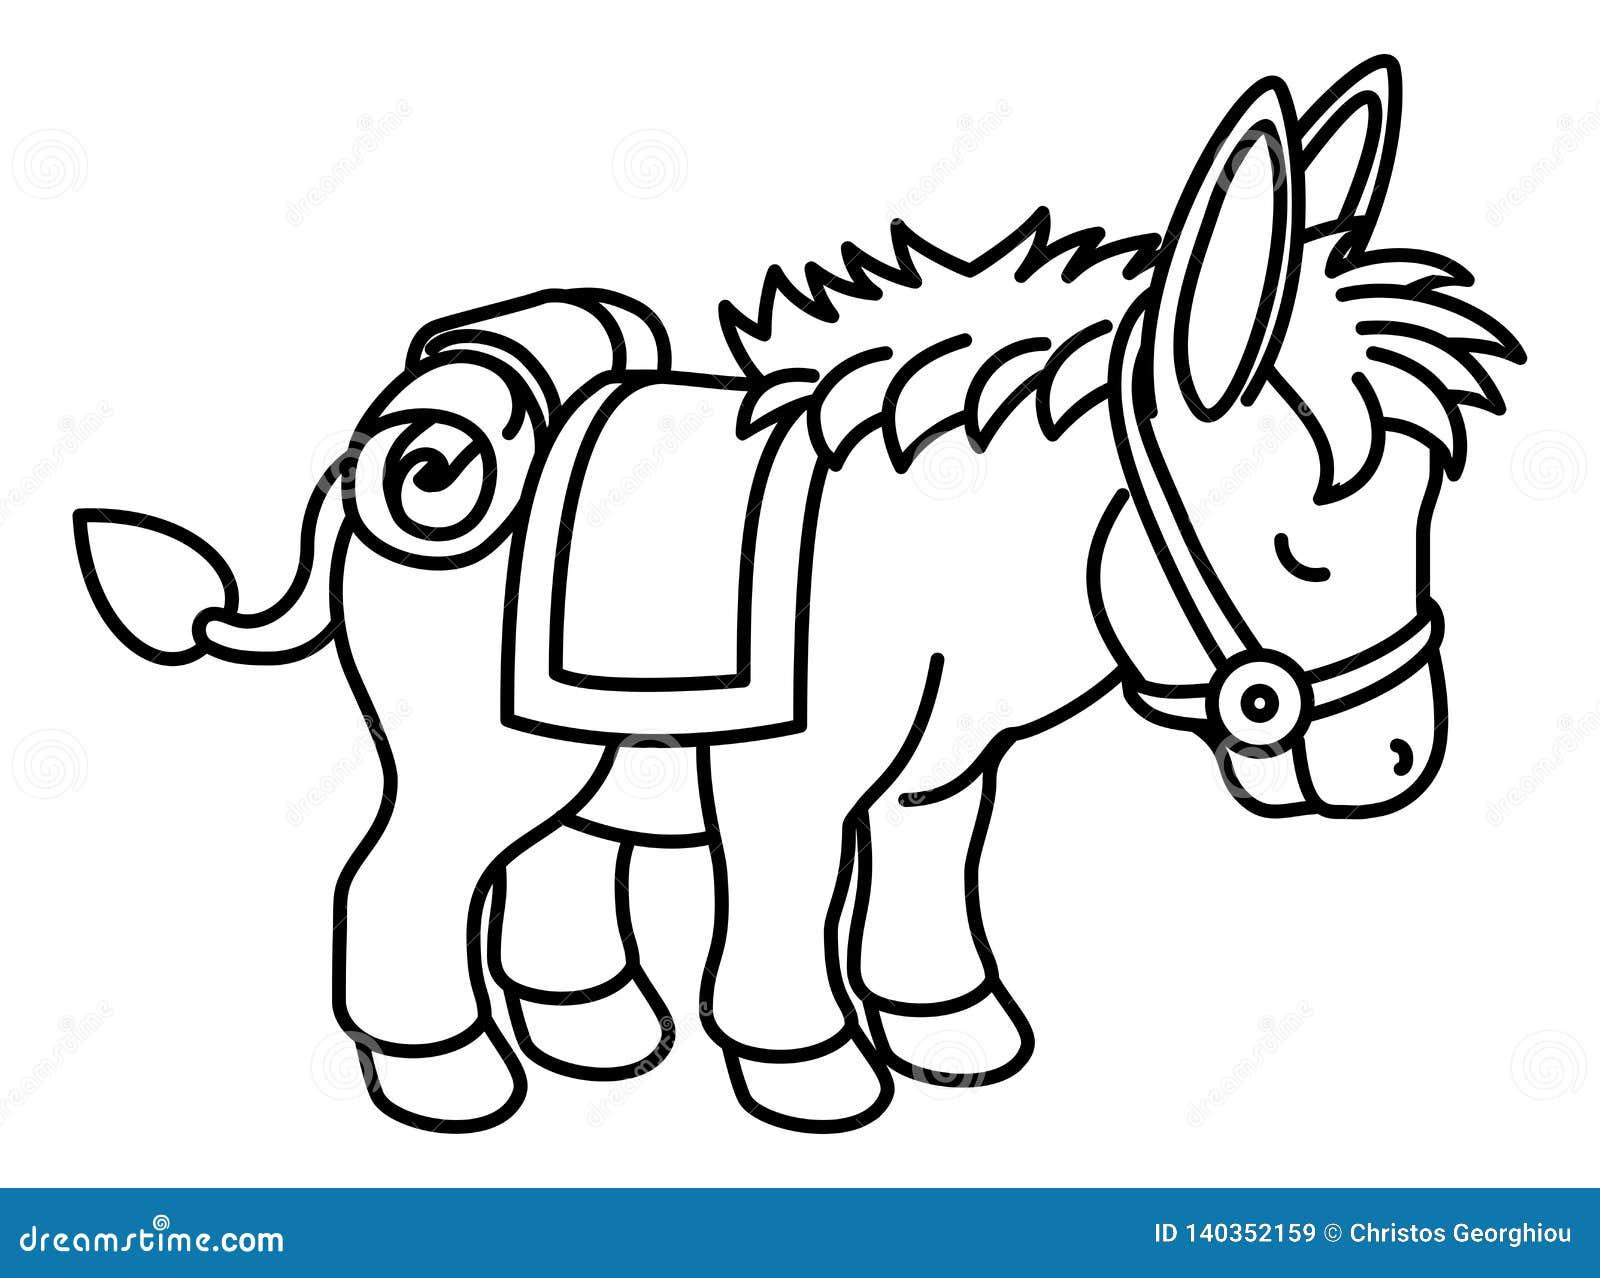 Personaje De Dibujos Animados Animal Del Burro Ilustracion Del